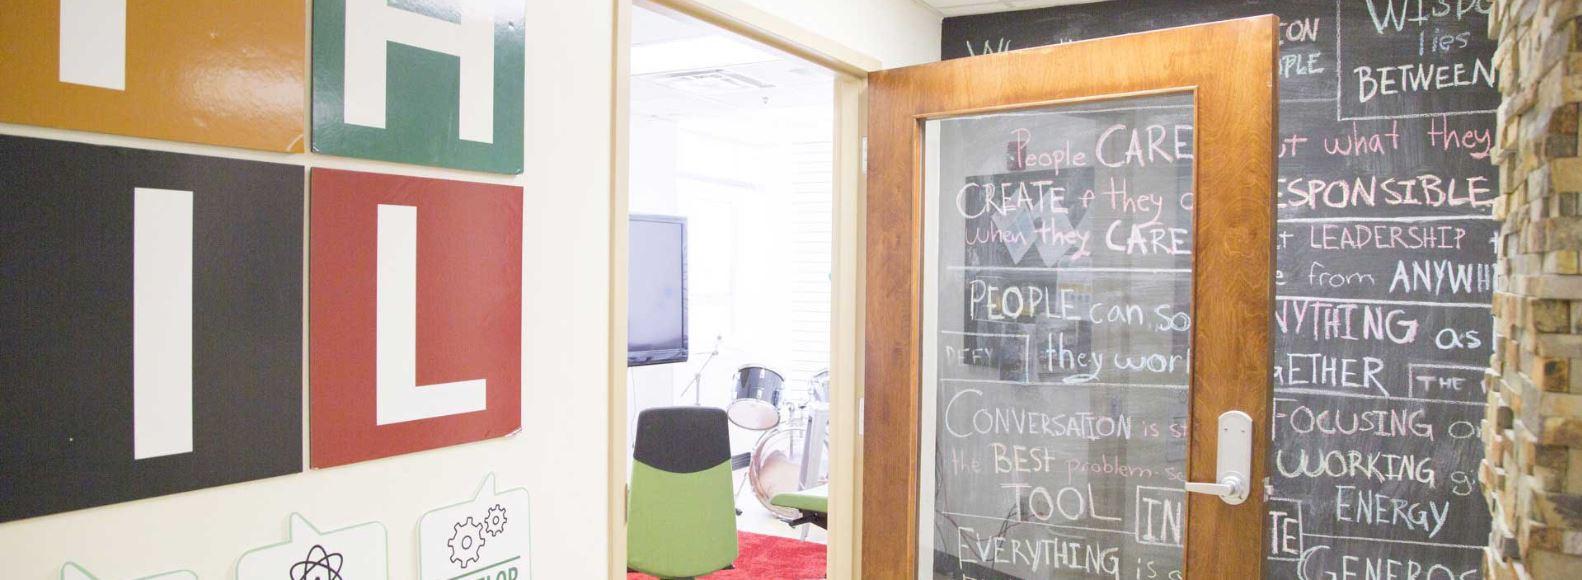 Florida Hospital Innovation Lab